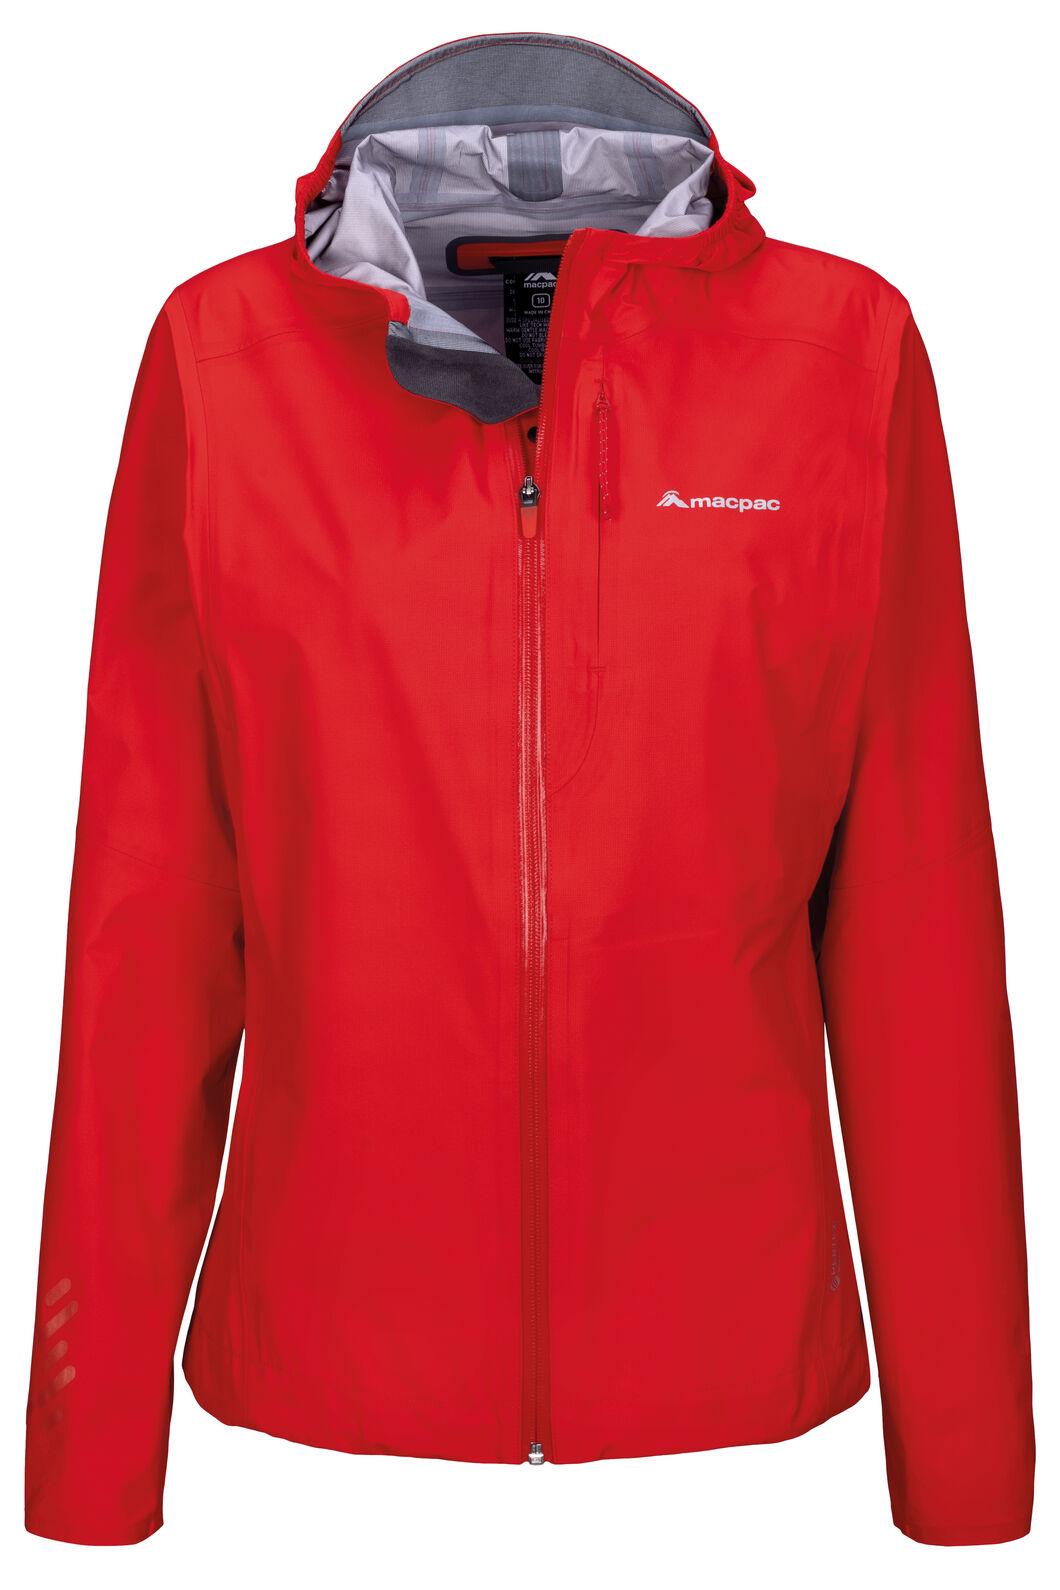 Macpac Tempo Pertex® Rain Jacket — Women's, Fiery Red, hi-res